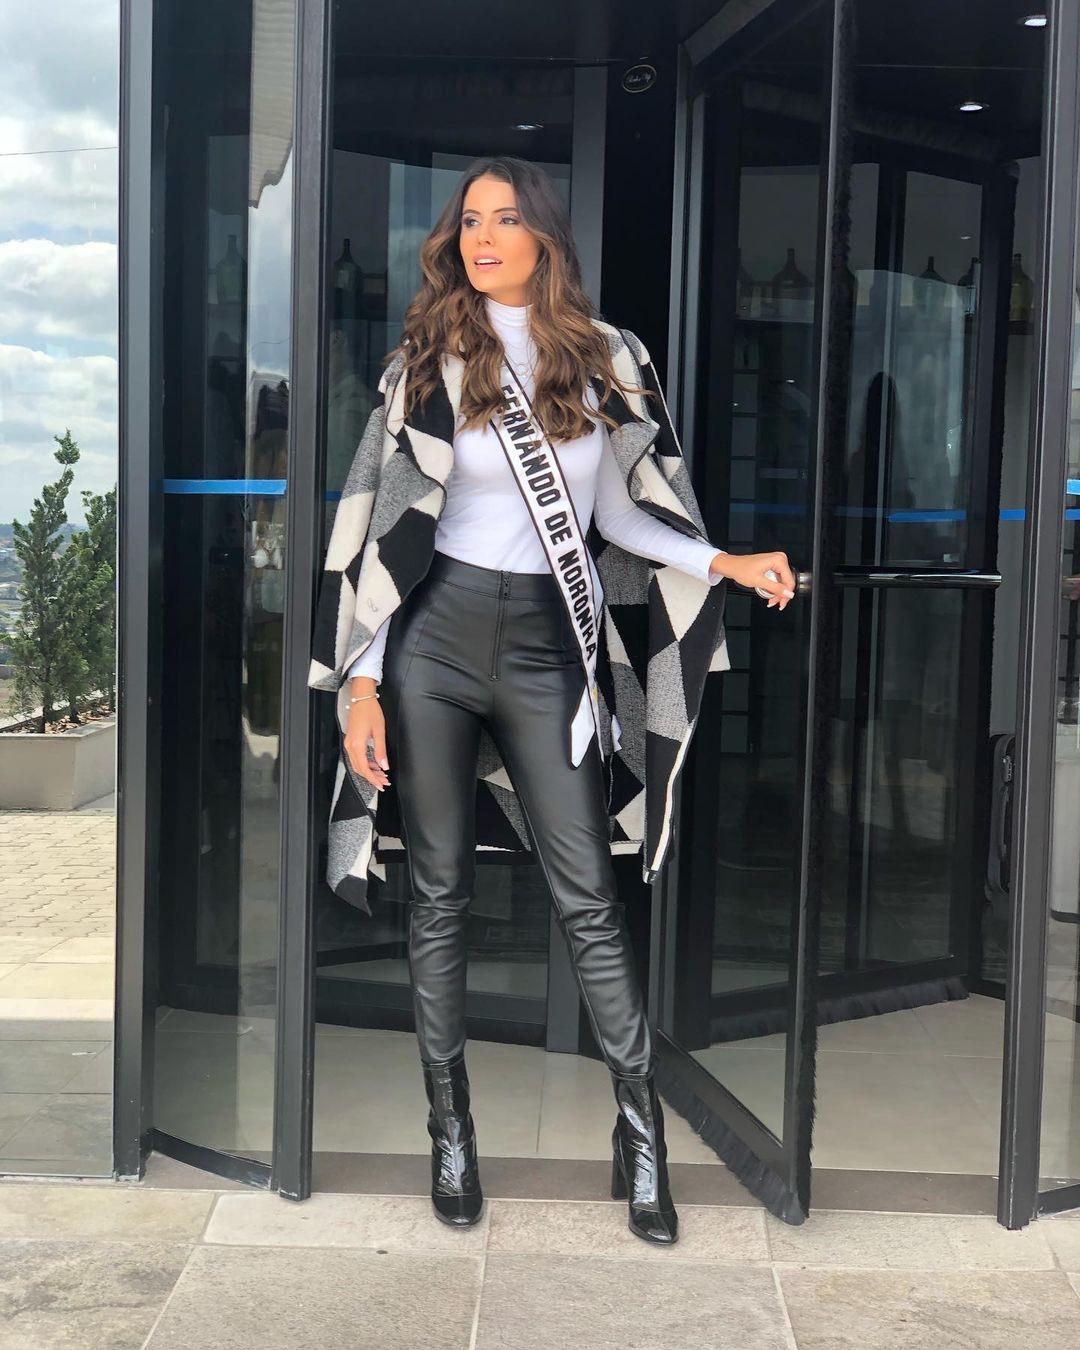 iully thaisa, top 5 de miss brasil mundo 2019. - Página 4 Fymahb10